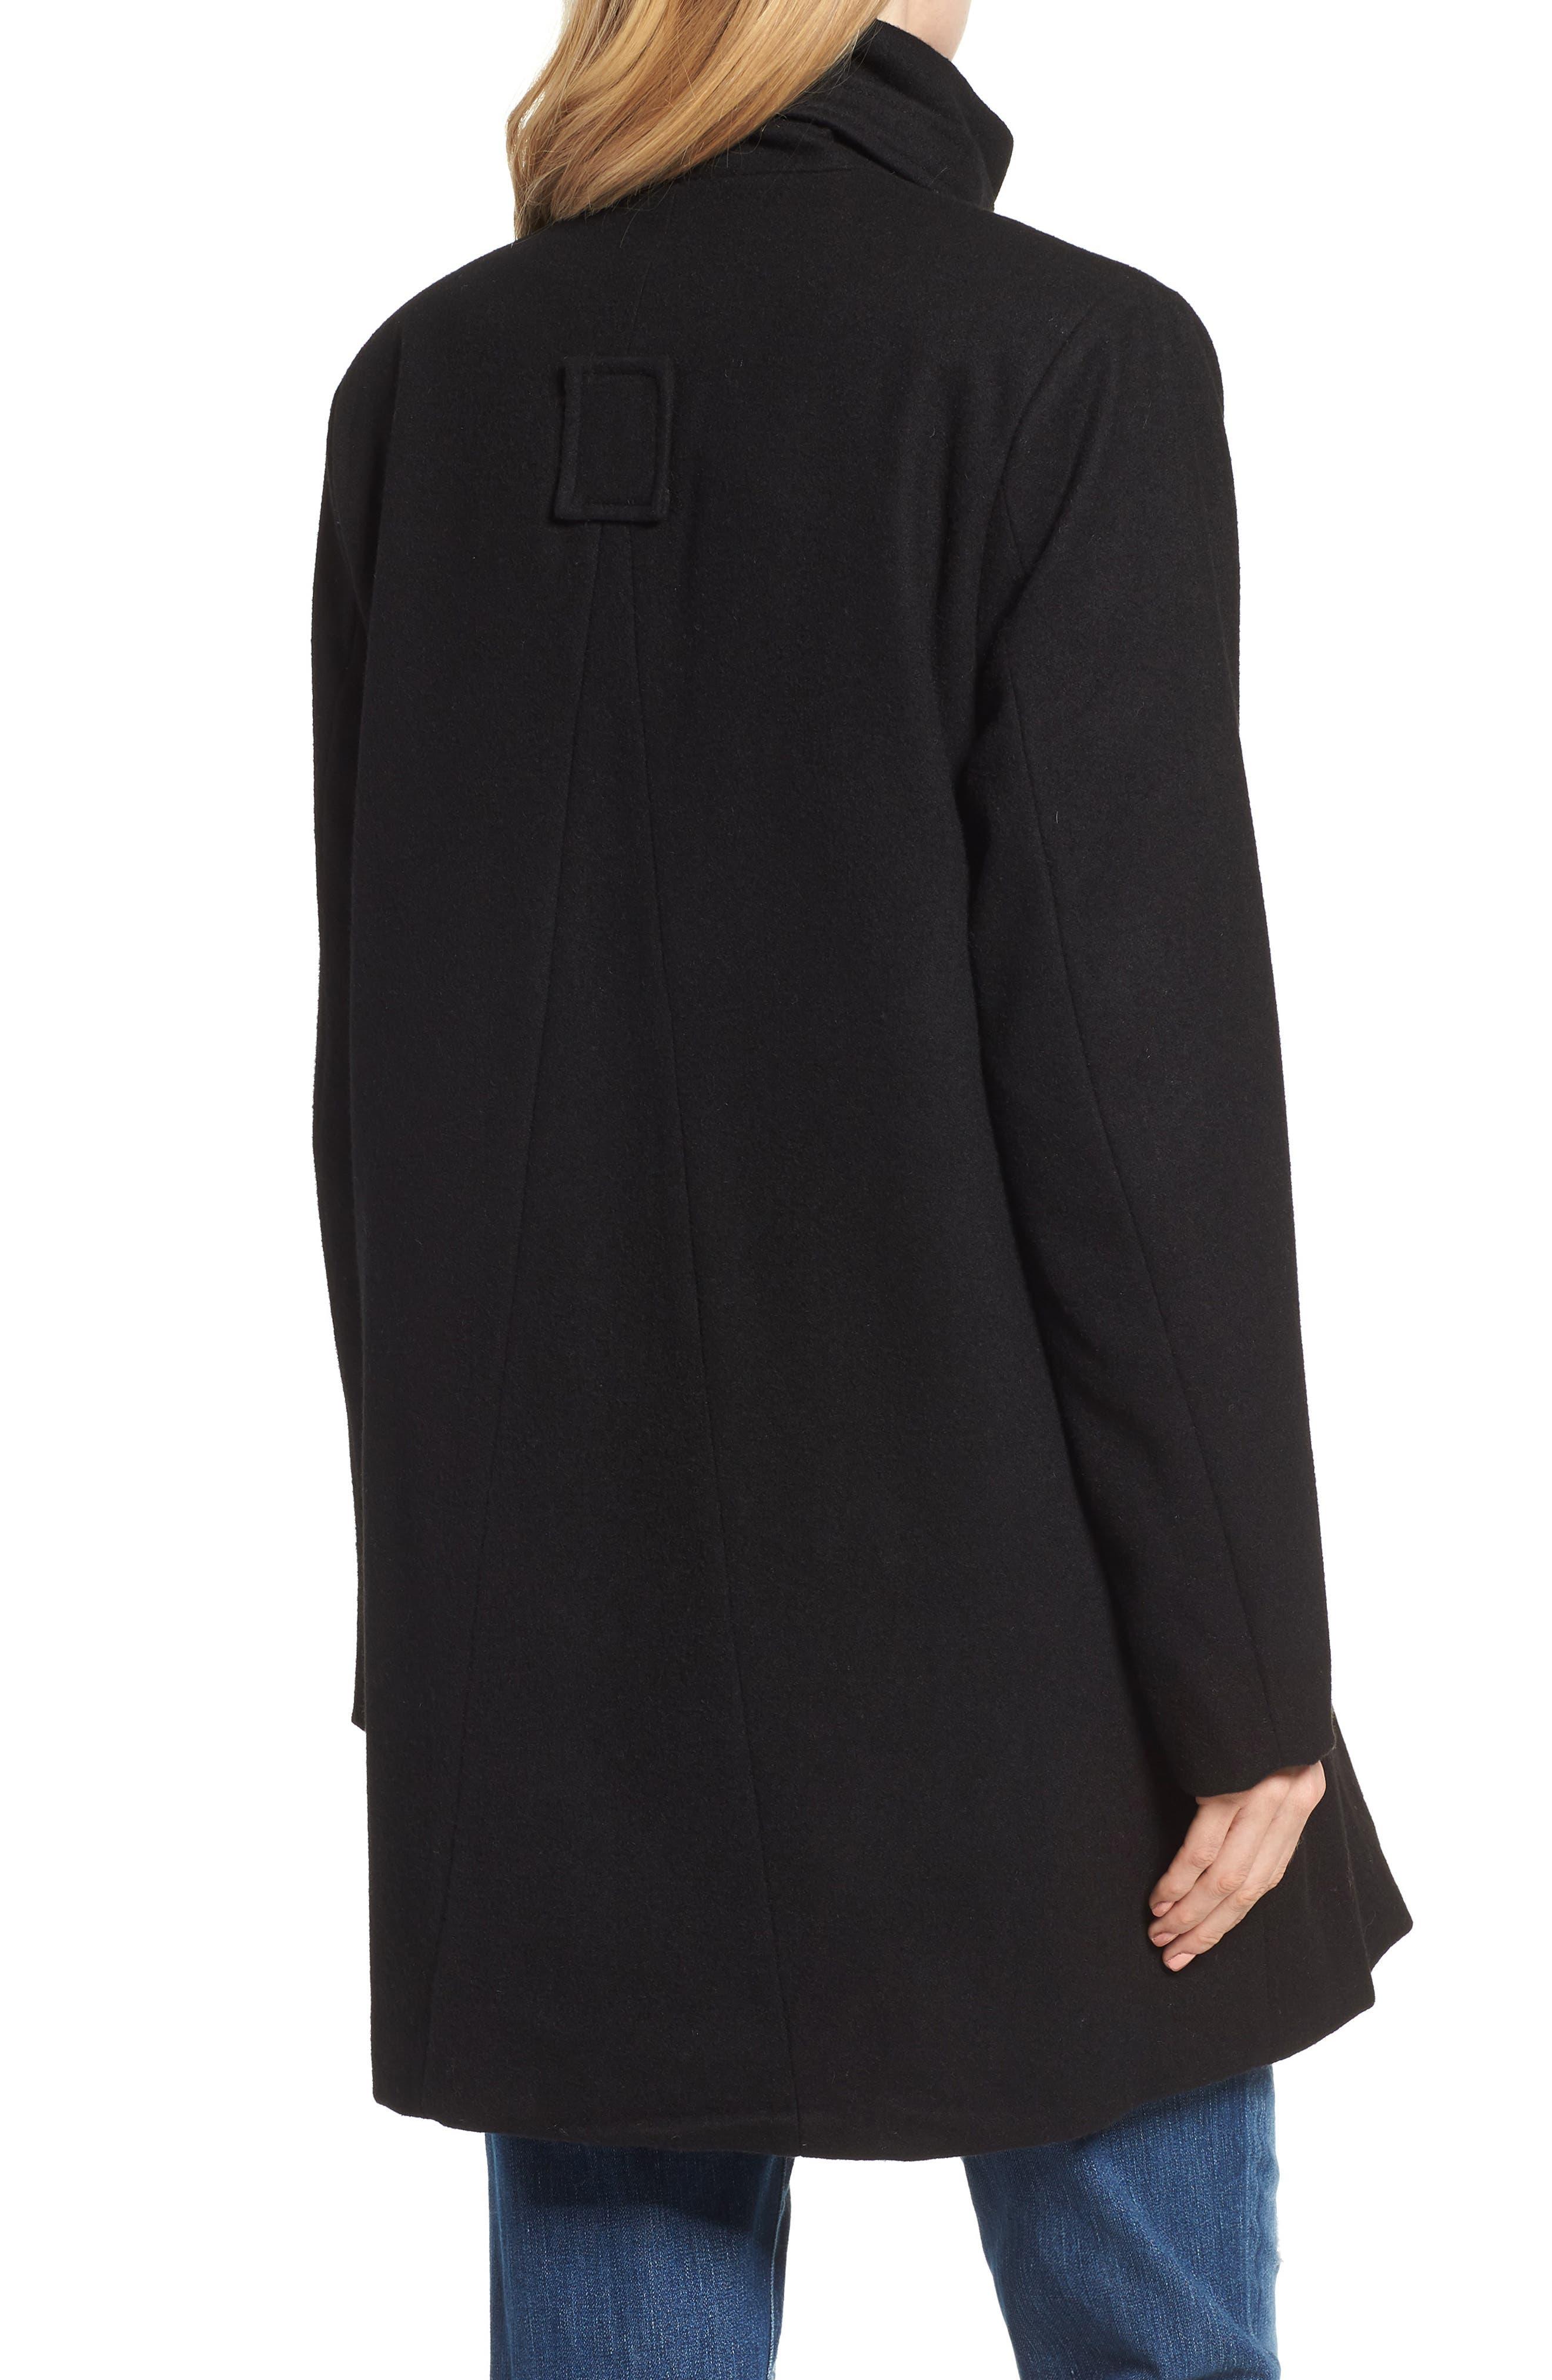 Convertible 3-in-1 Maternity/Nursing Coat,                             Alternate thumbnail 3, color,                             Black